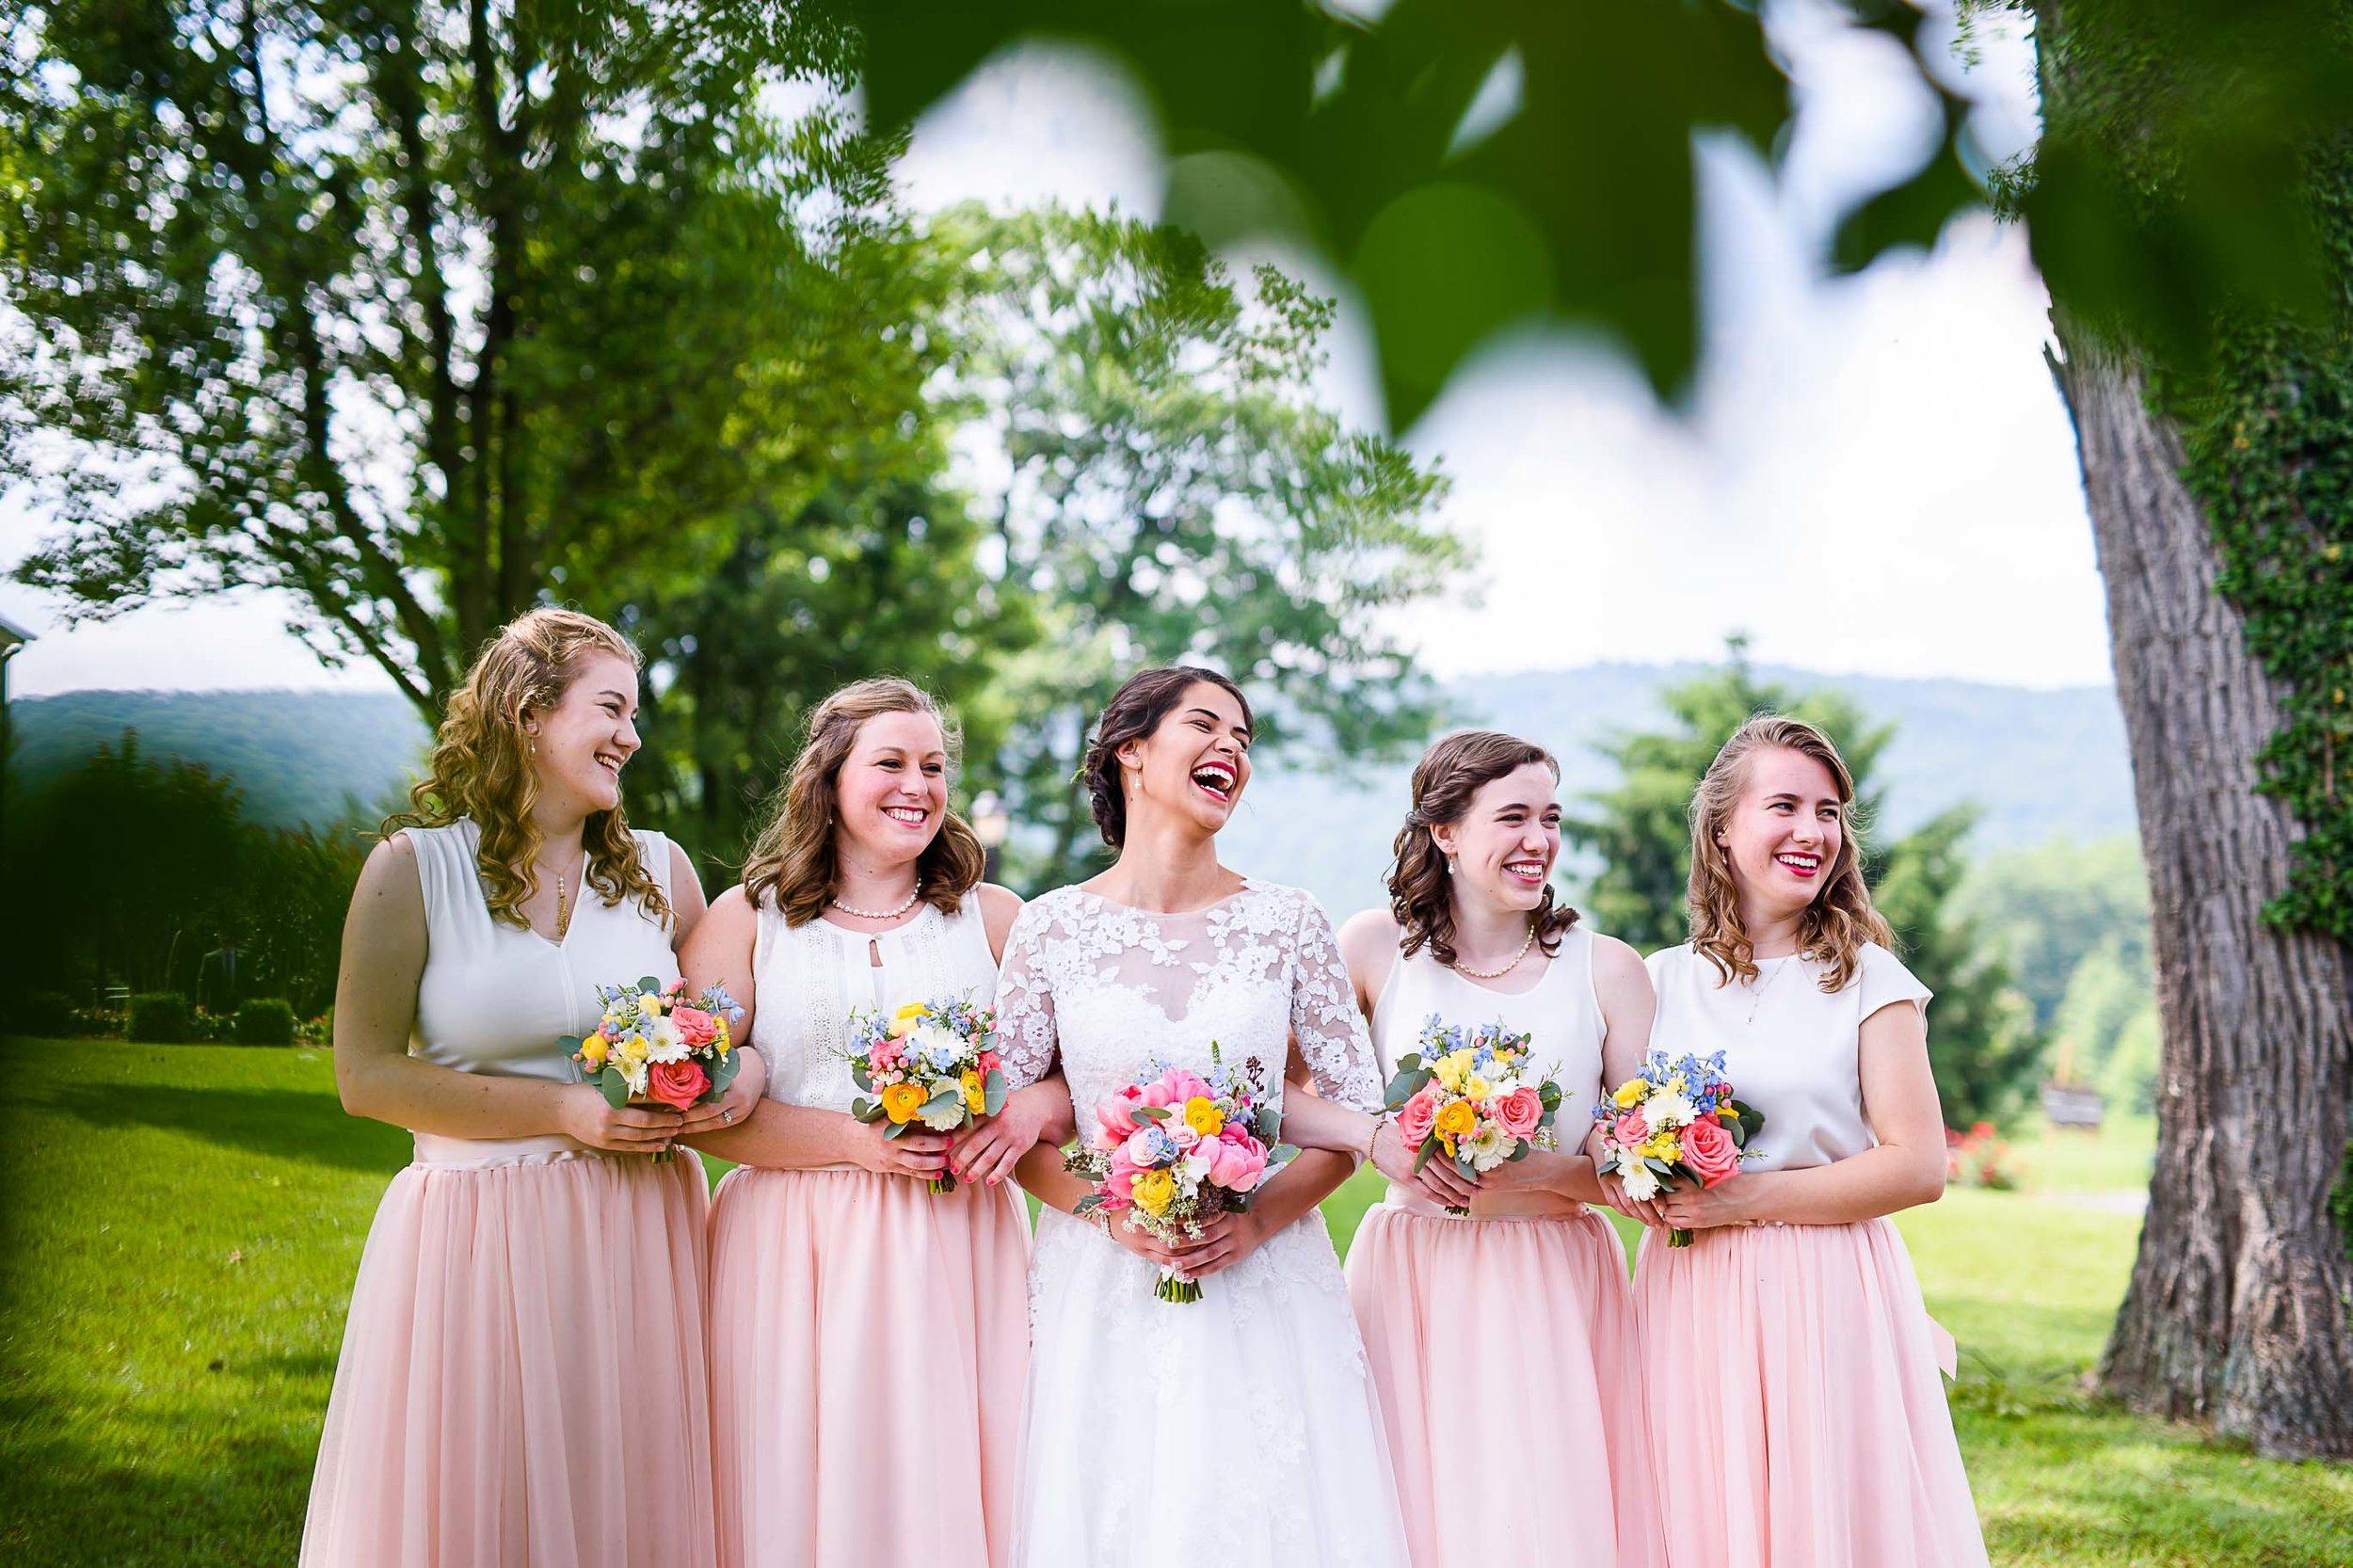 Evergreen Country Club wedding photos30.jpg